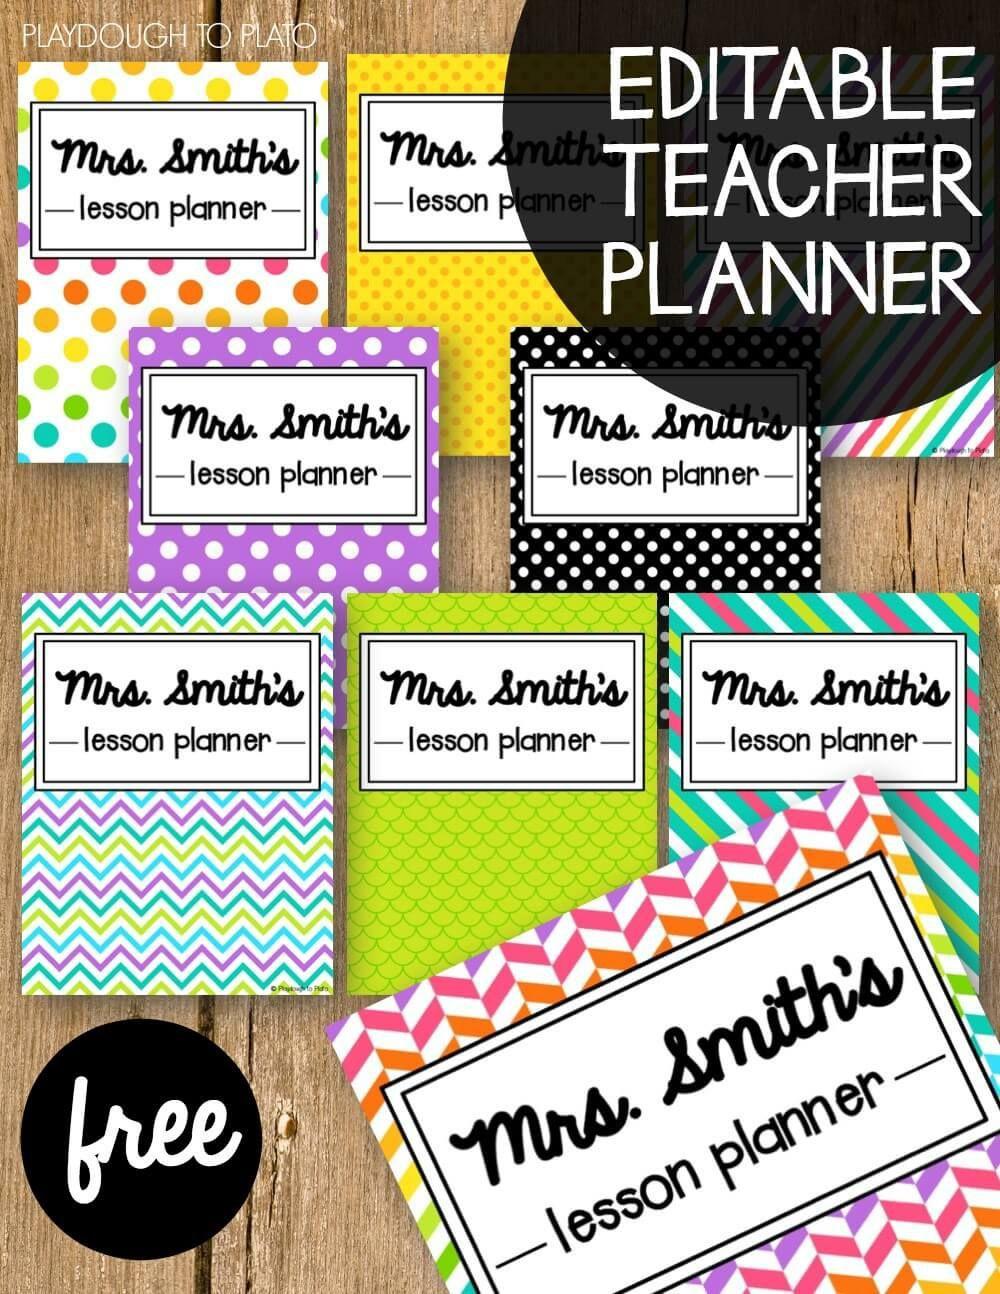 001 Simple Free Printable Teacher Binder Template Idea  TemplatesFull